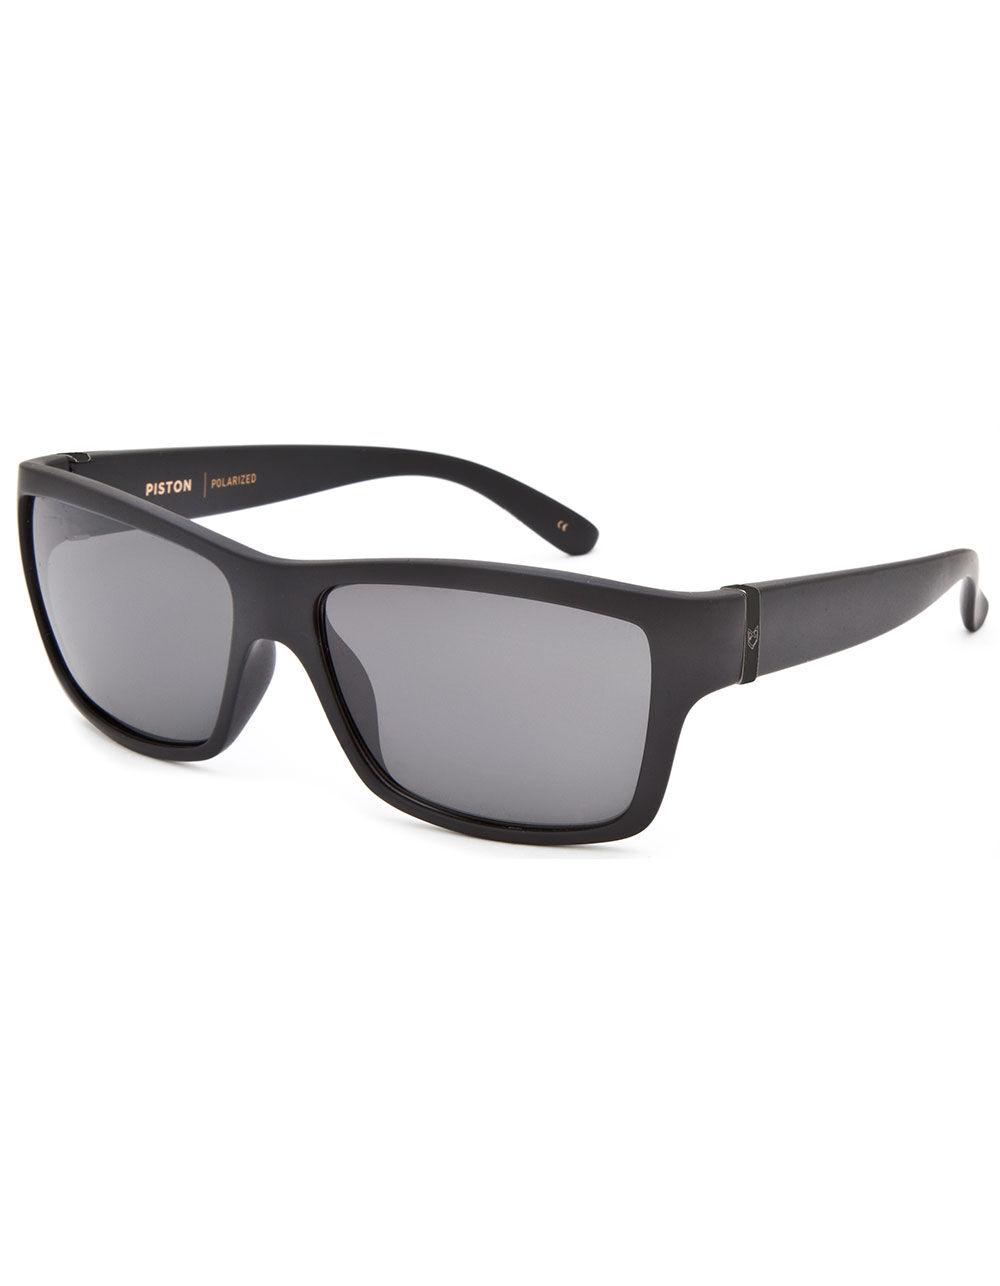 MADSON Piston Polarized Sunglasses